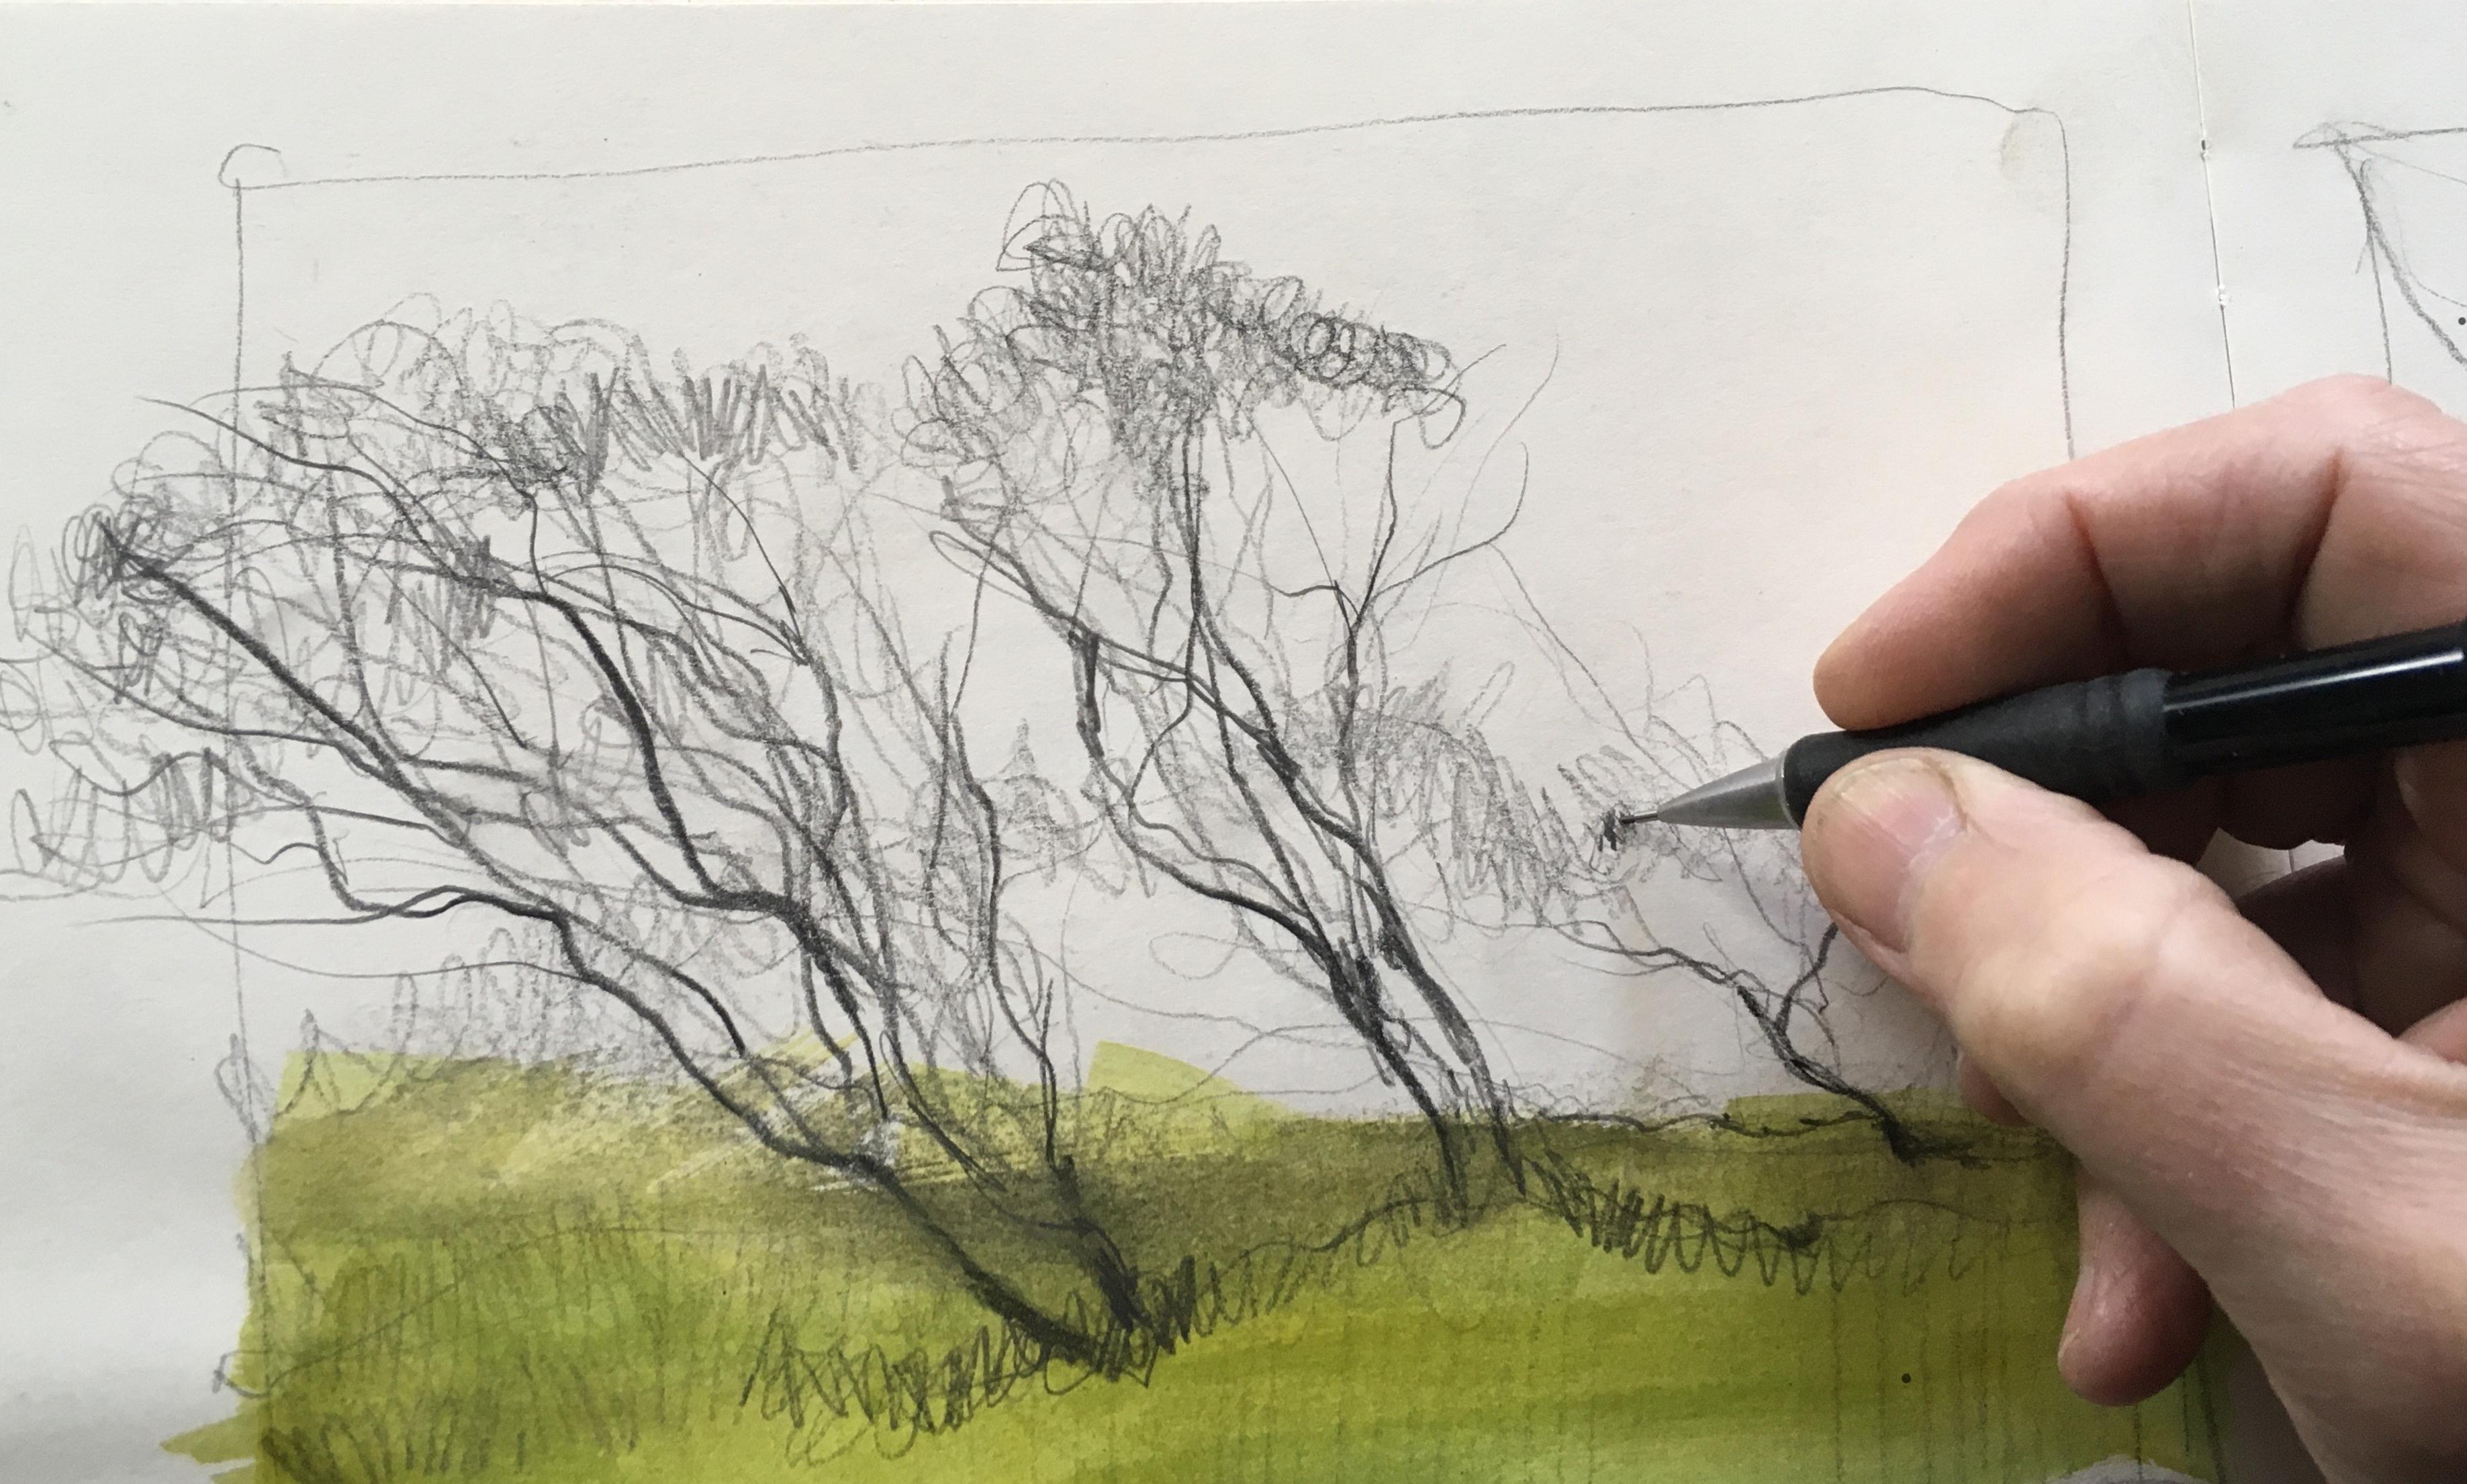 Bammeld_David_Sketchbook-trees 2.JPG